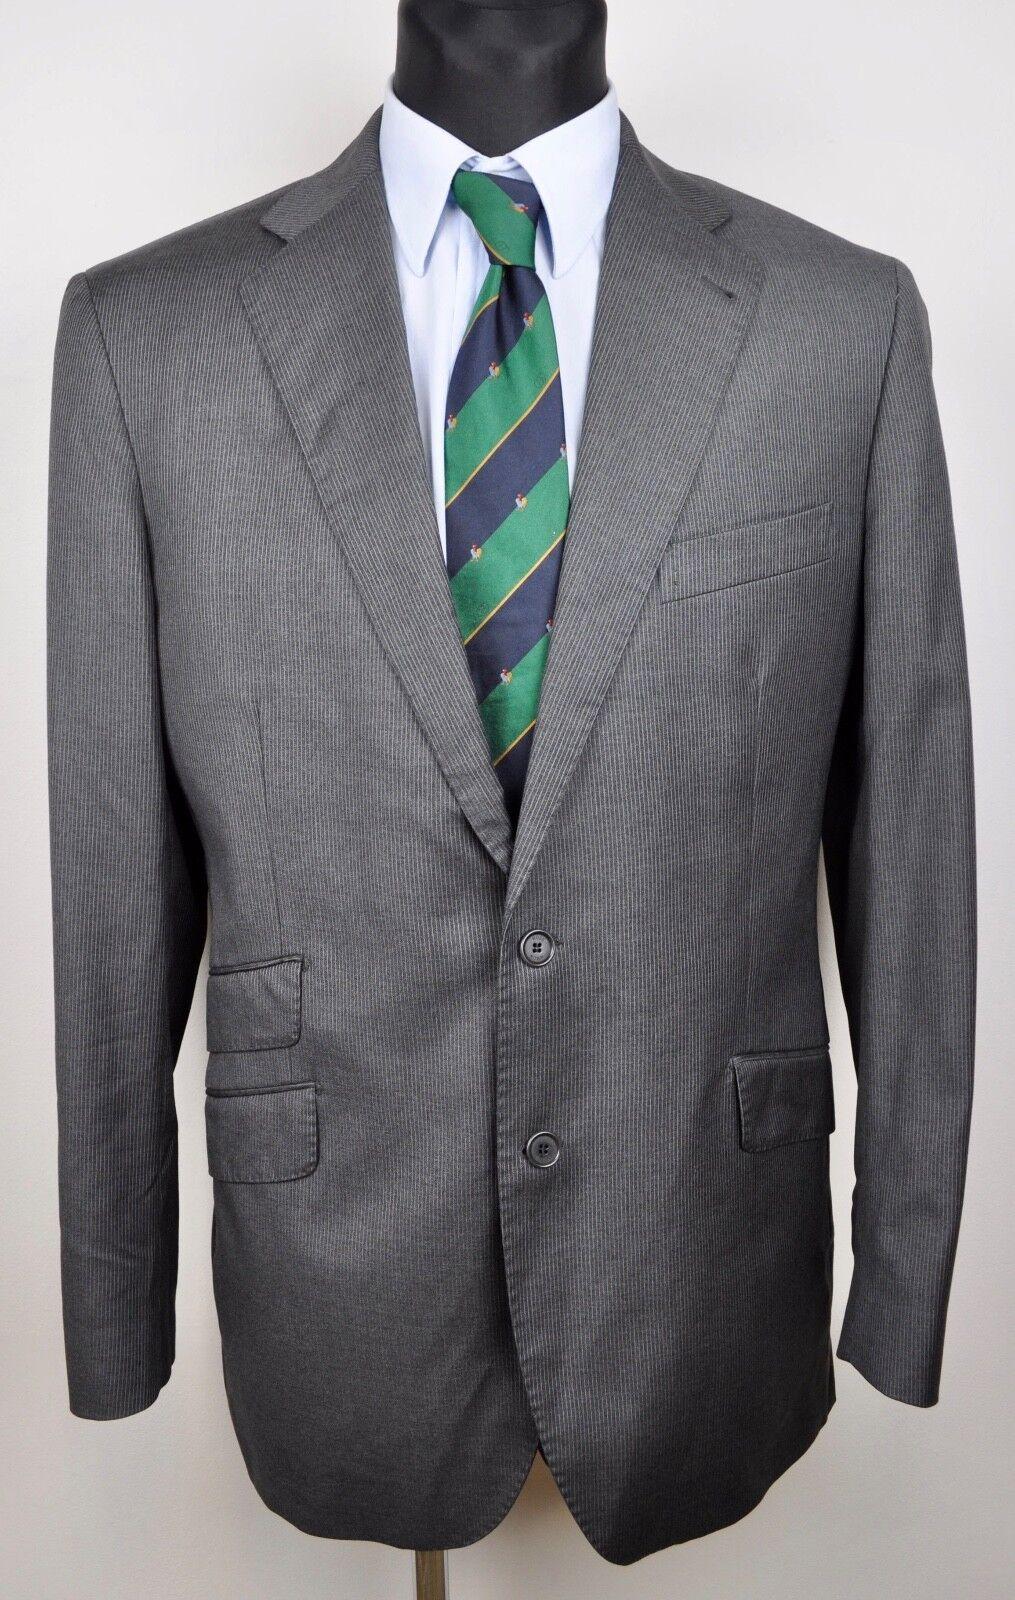 ROSE & BORN Super 120s Wool by LORO PIANA Charcoal Blazer UK 40 Coat EUR 50 Coat